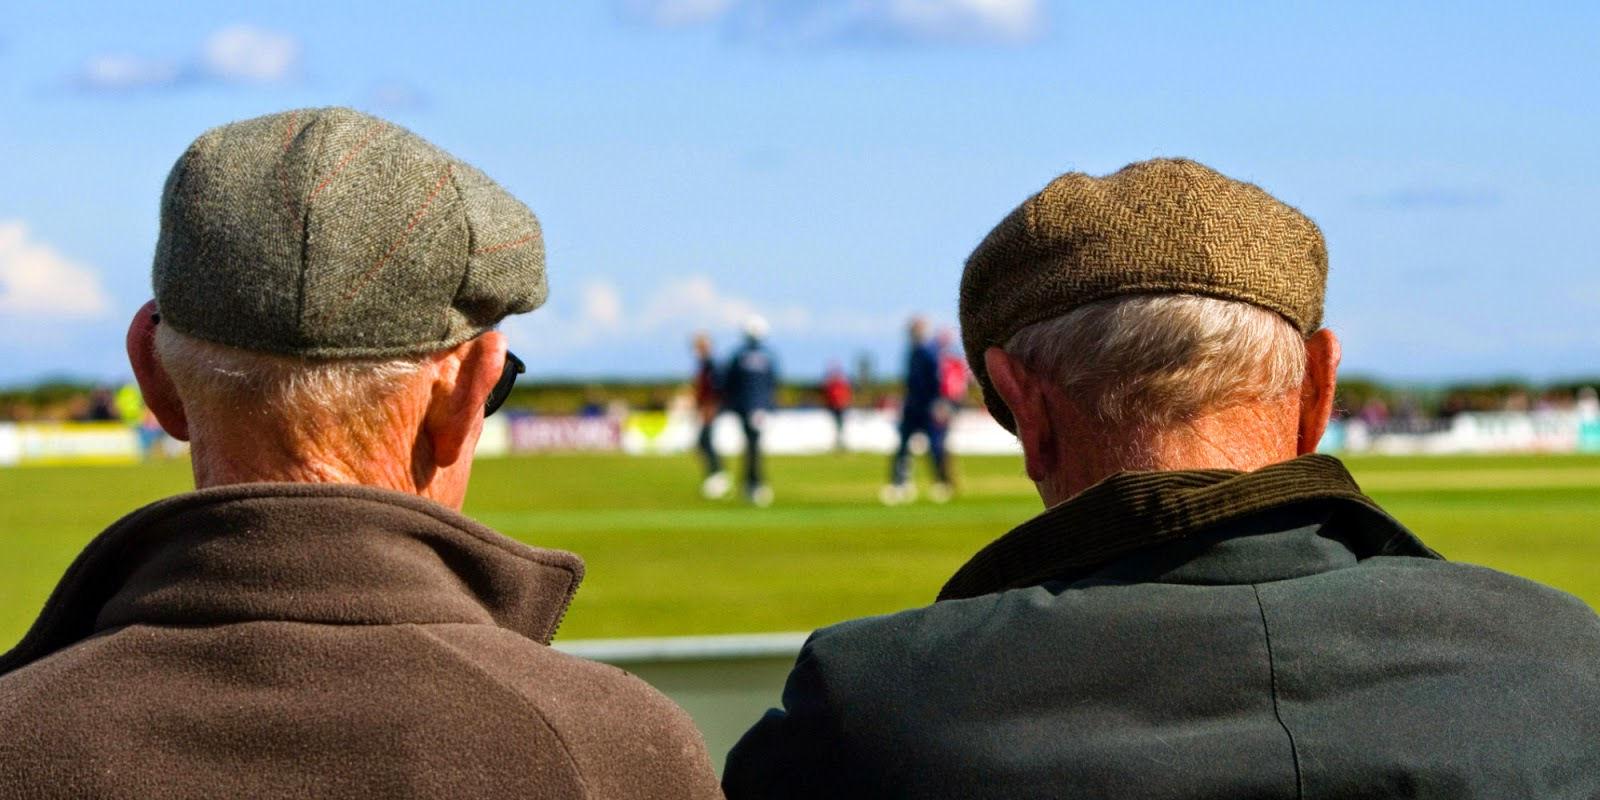 lavoro pensioni bonus 80 euro renzi